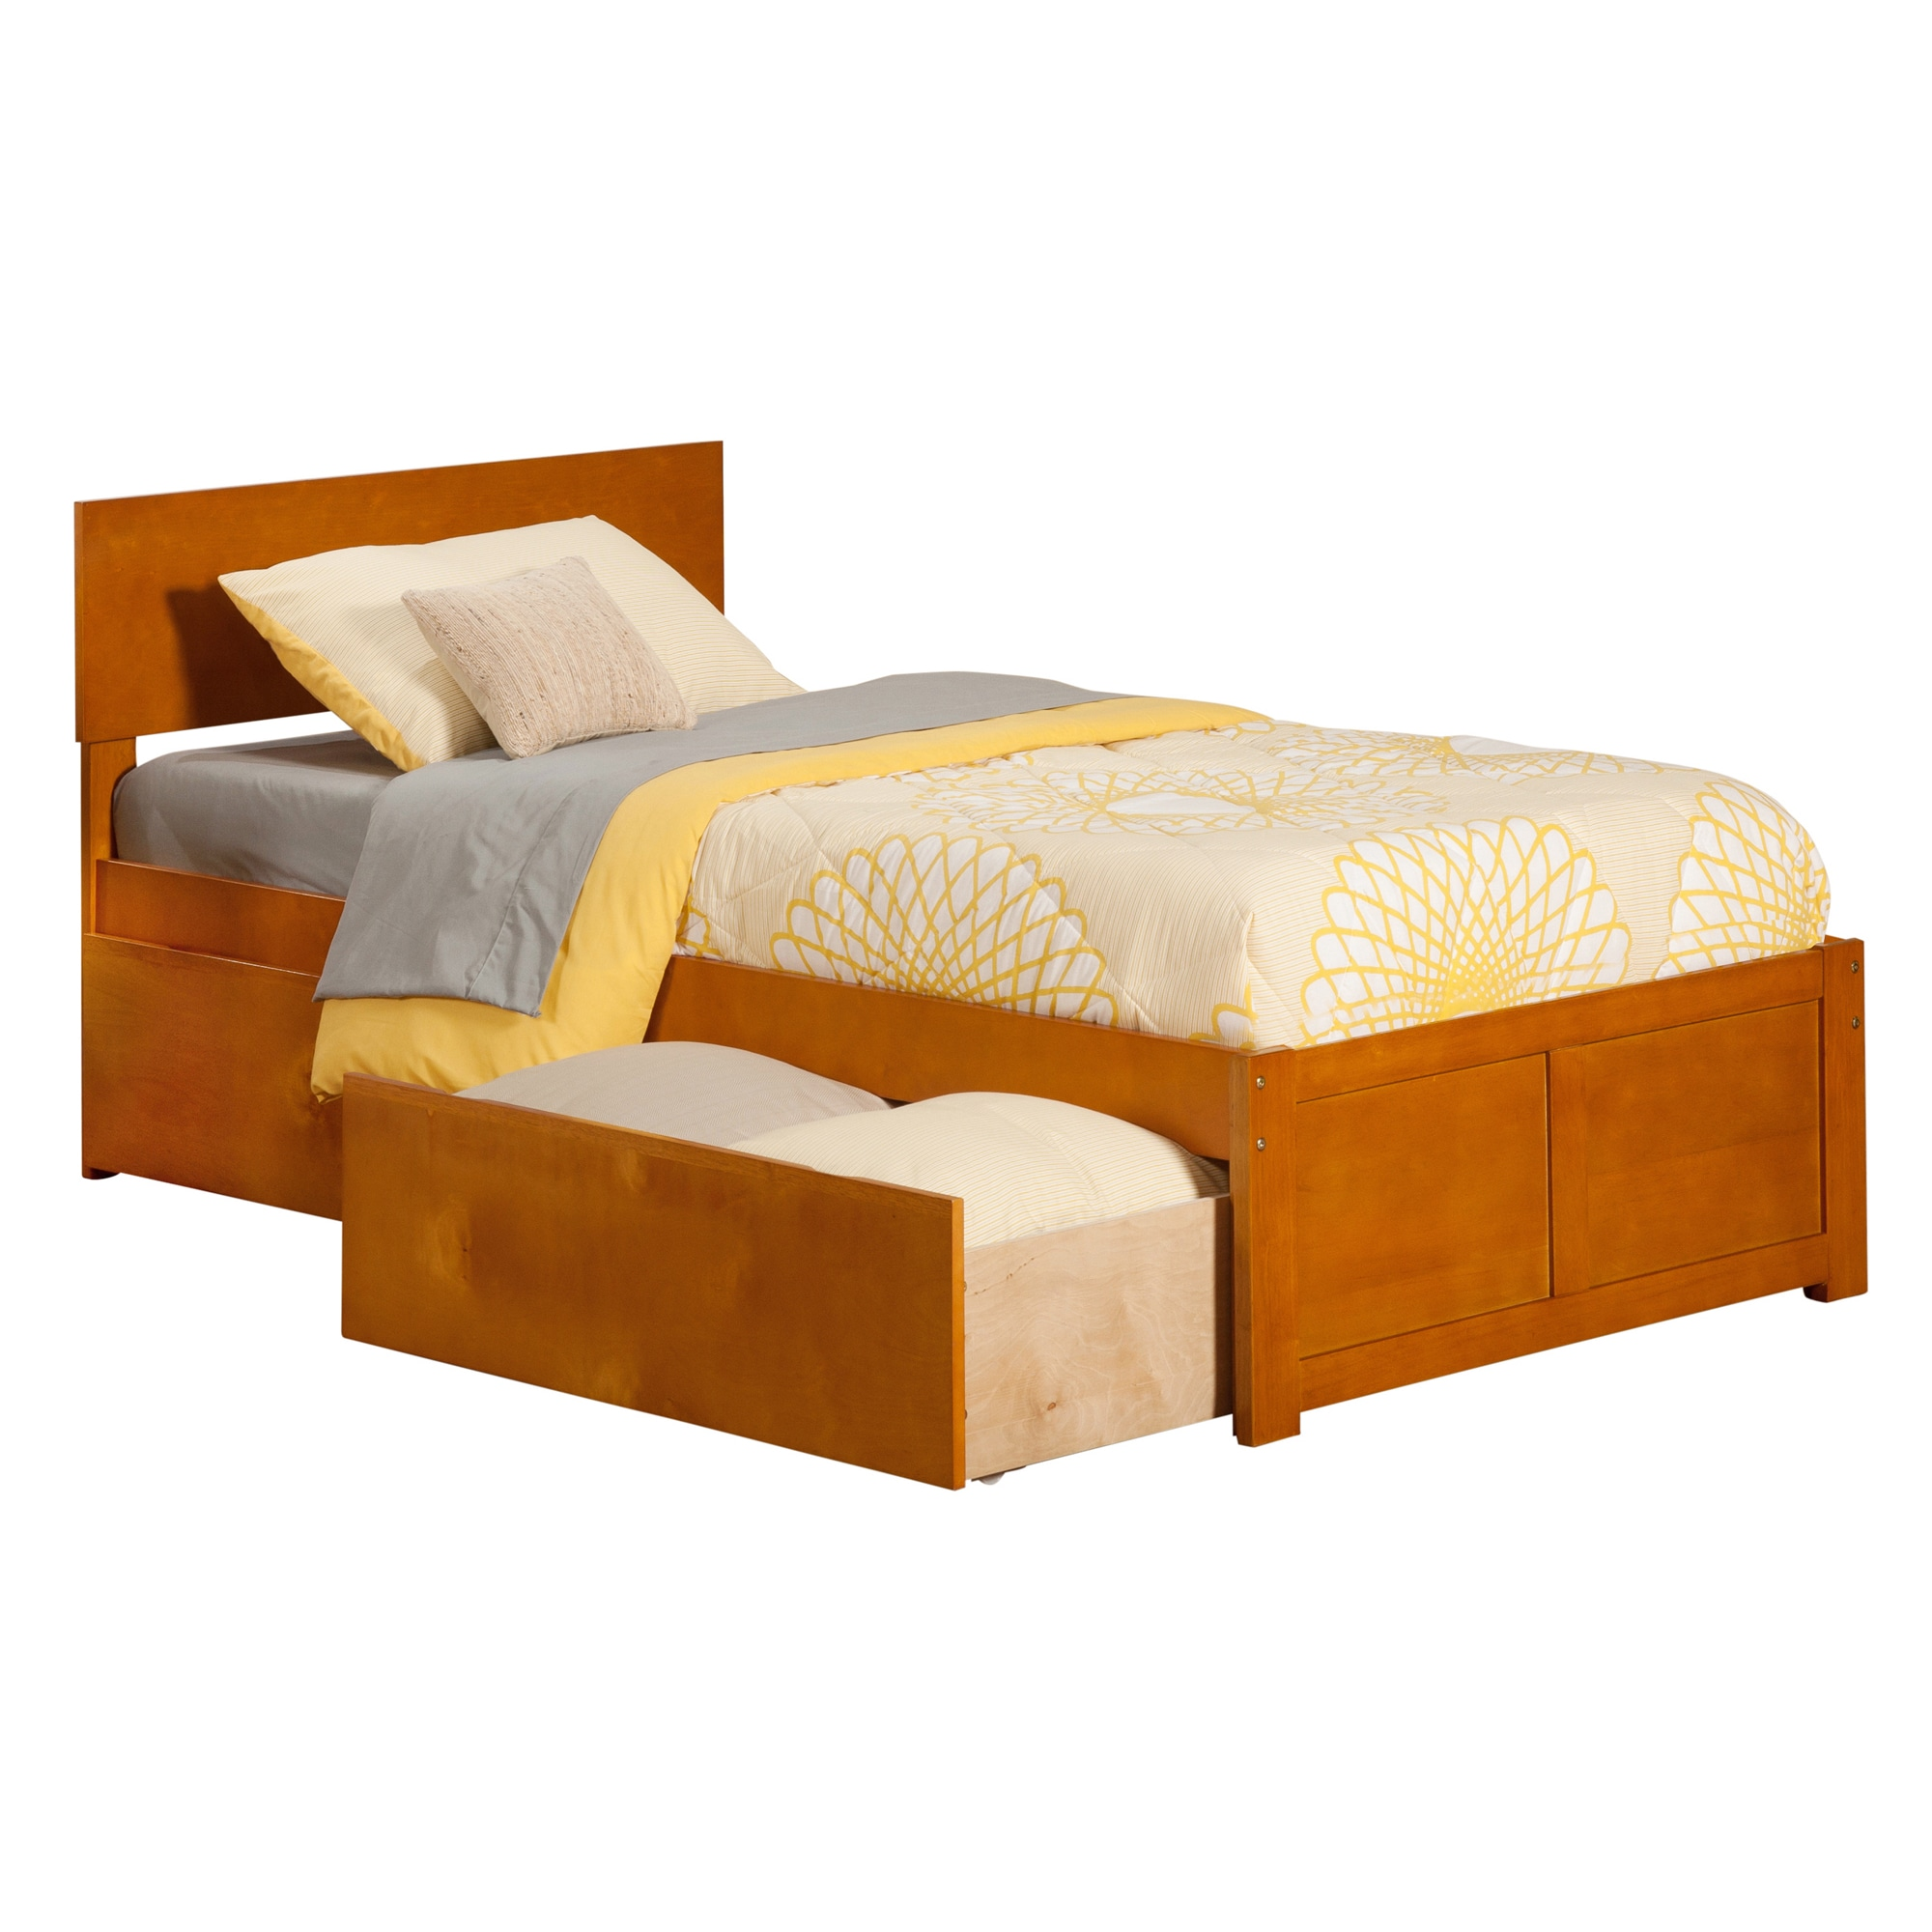 Atlantic Furniture Atlantic Orlando Caramel Latte Twin-size Flat-panel Foot Board with 2 Urban Bed Drawers